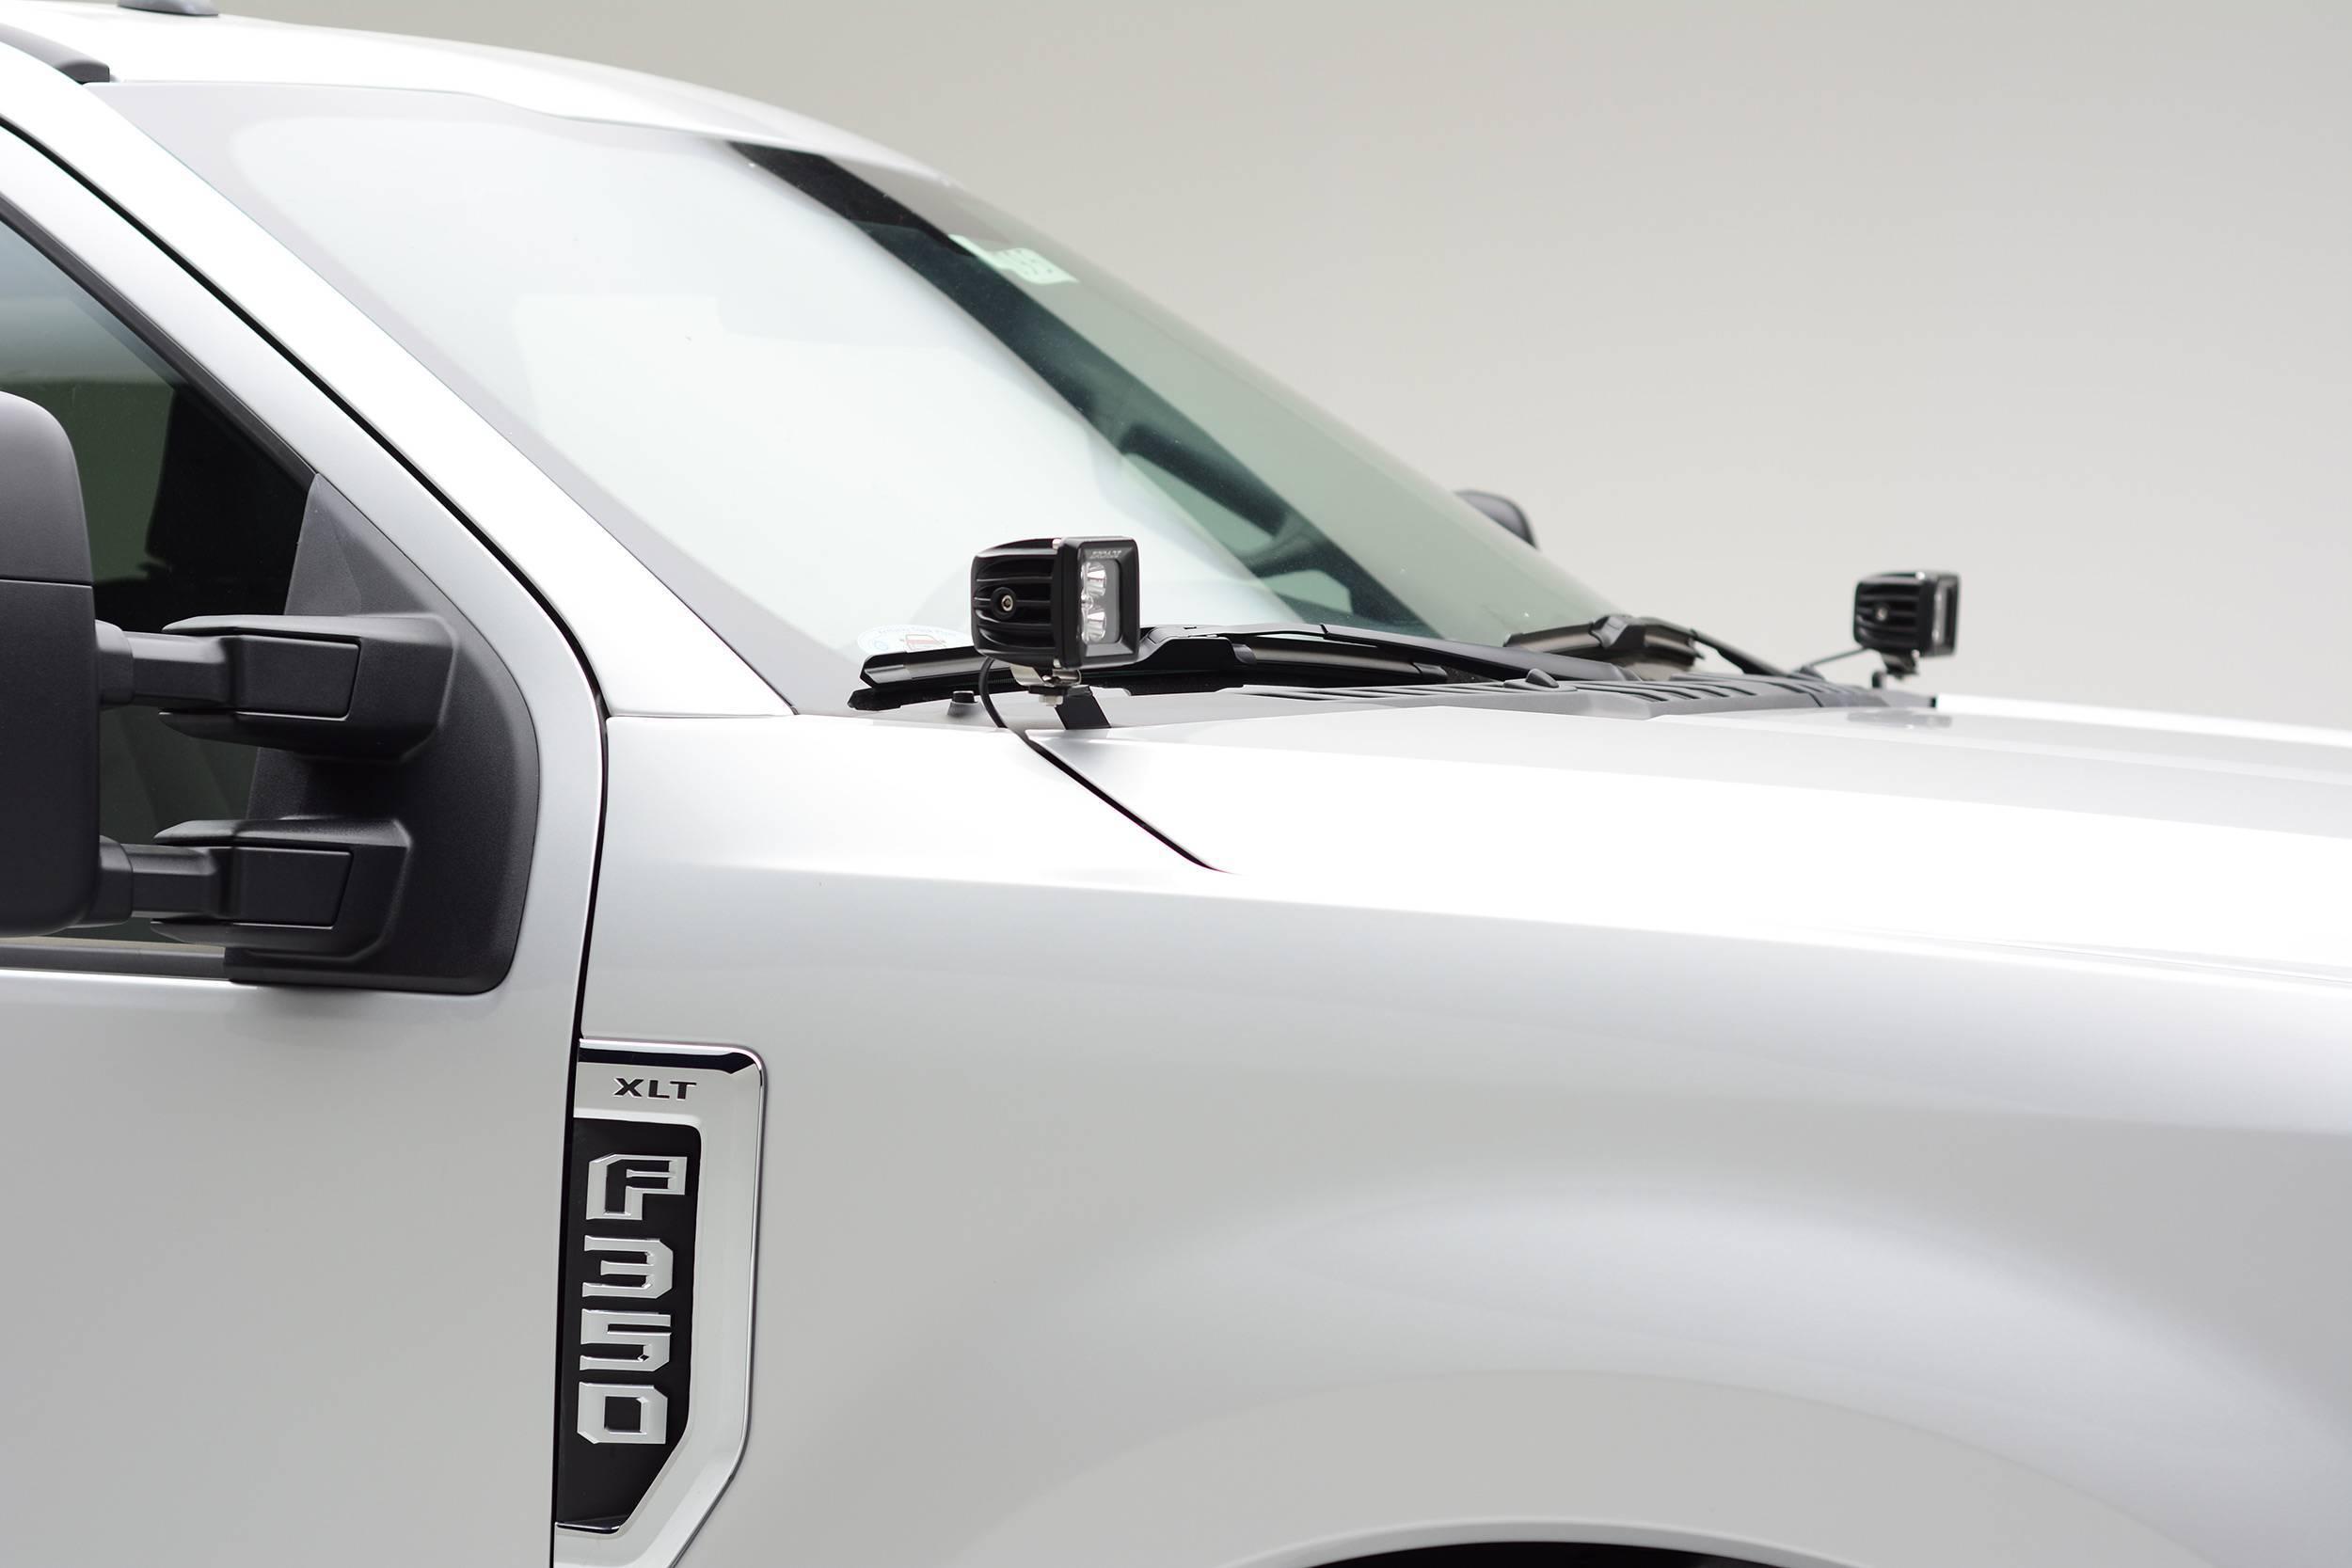 ZROADZ - 2017-2021 Ford Super Duty Hood Hinge LED Kit with (2) 3 Inch LED Pod Lights - PN #Z365471-KIT2